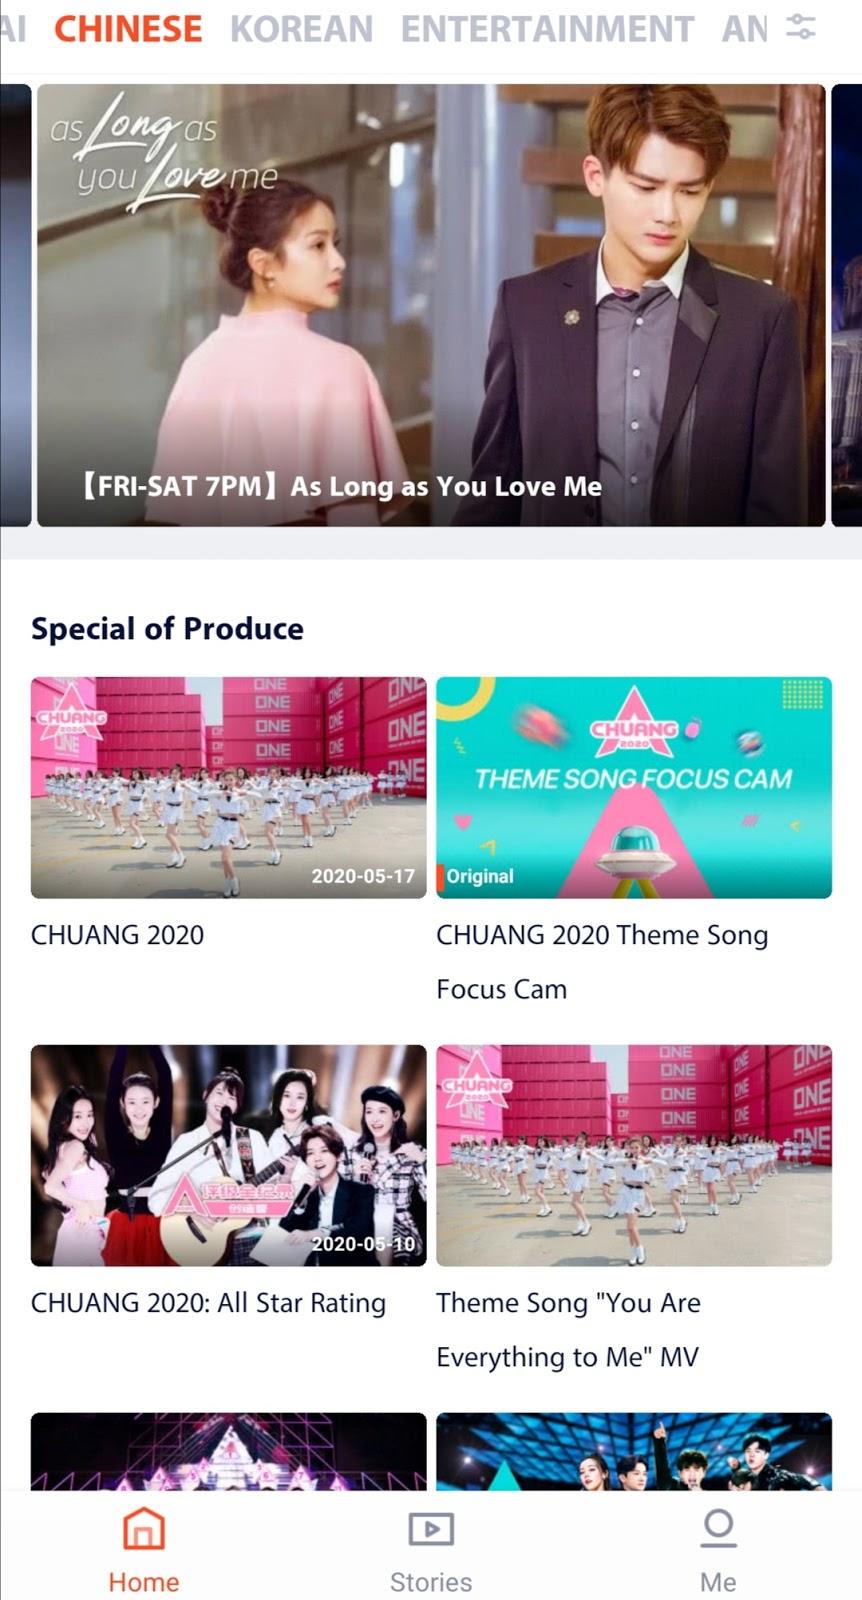 Top 13 Best Korean Drama Apps To Download Korean Movies Kdramas With English Subtitles Free In 2021